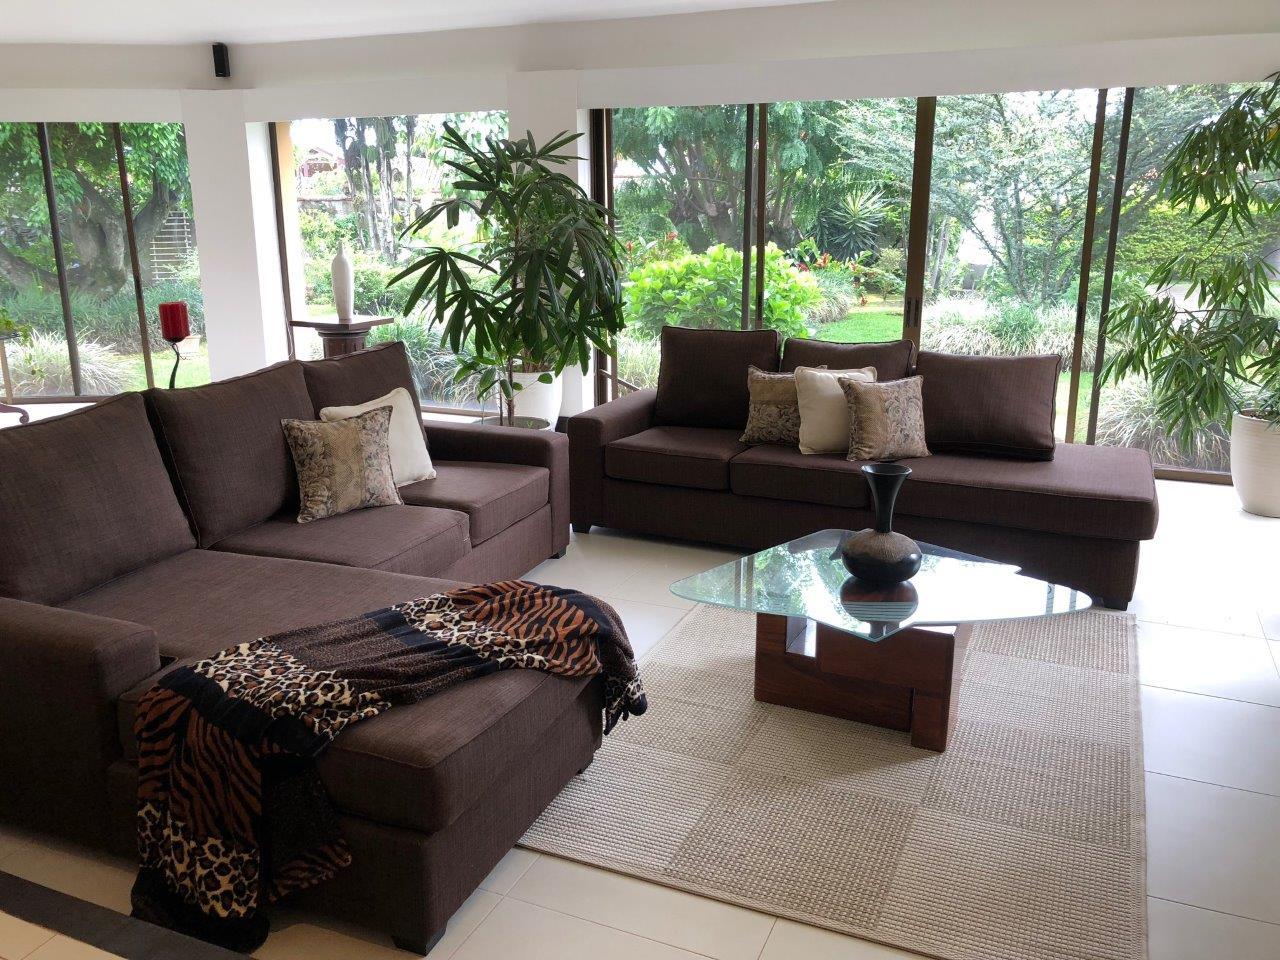 House For Sale in Belen